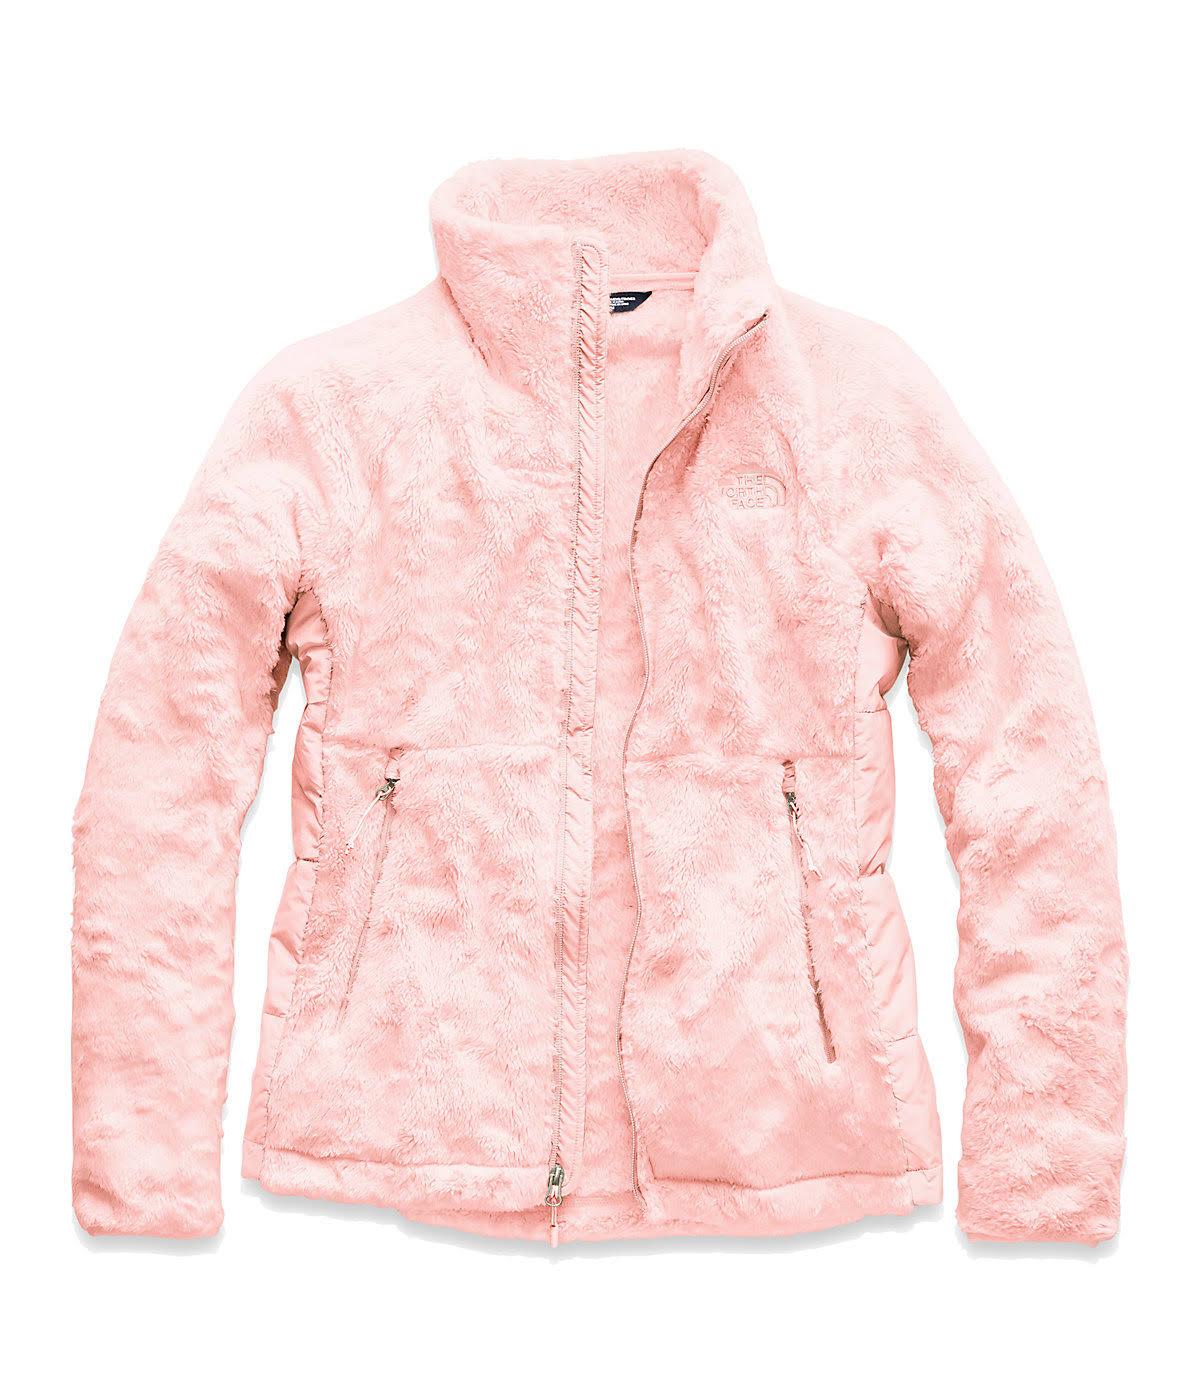 Cremallera Face Xs tamaño De Chaqueta Para Completa The Osito North Hybrid Salt Mujeres Pink Con Sport 5xRxqTp